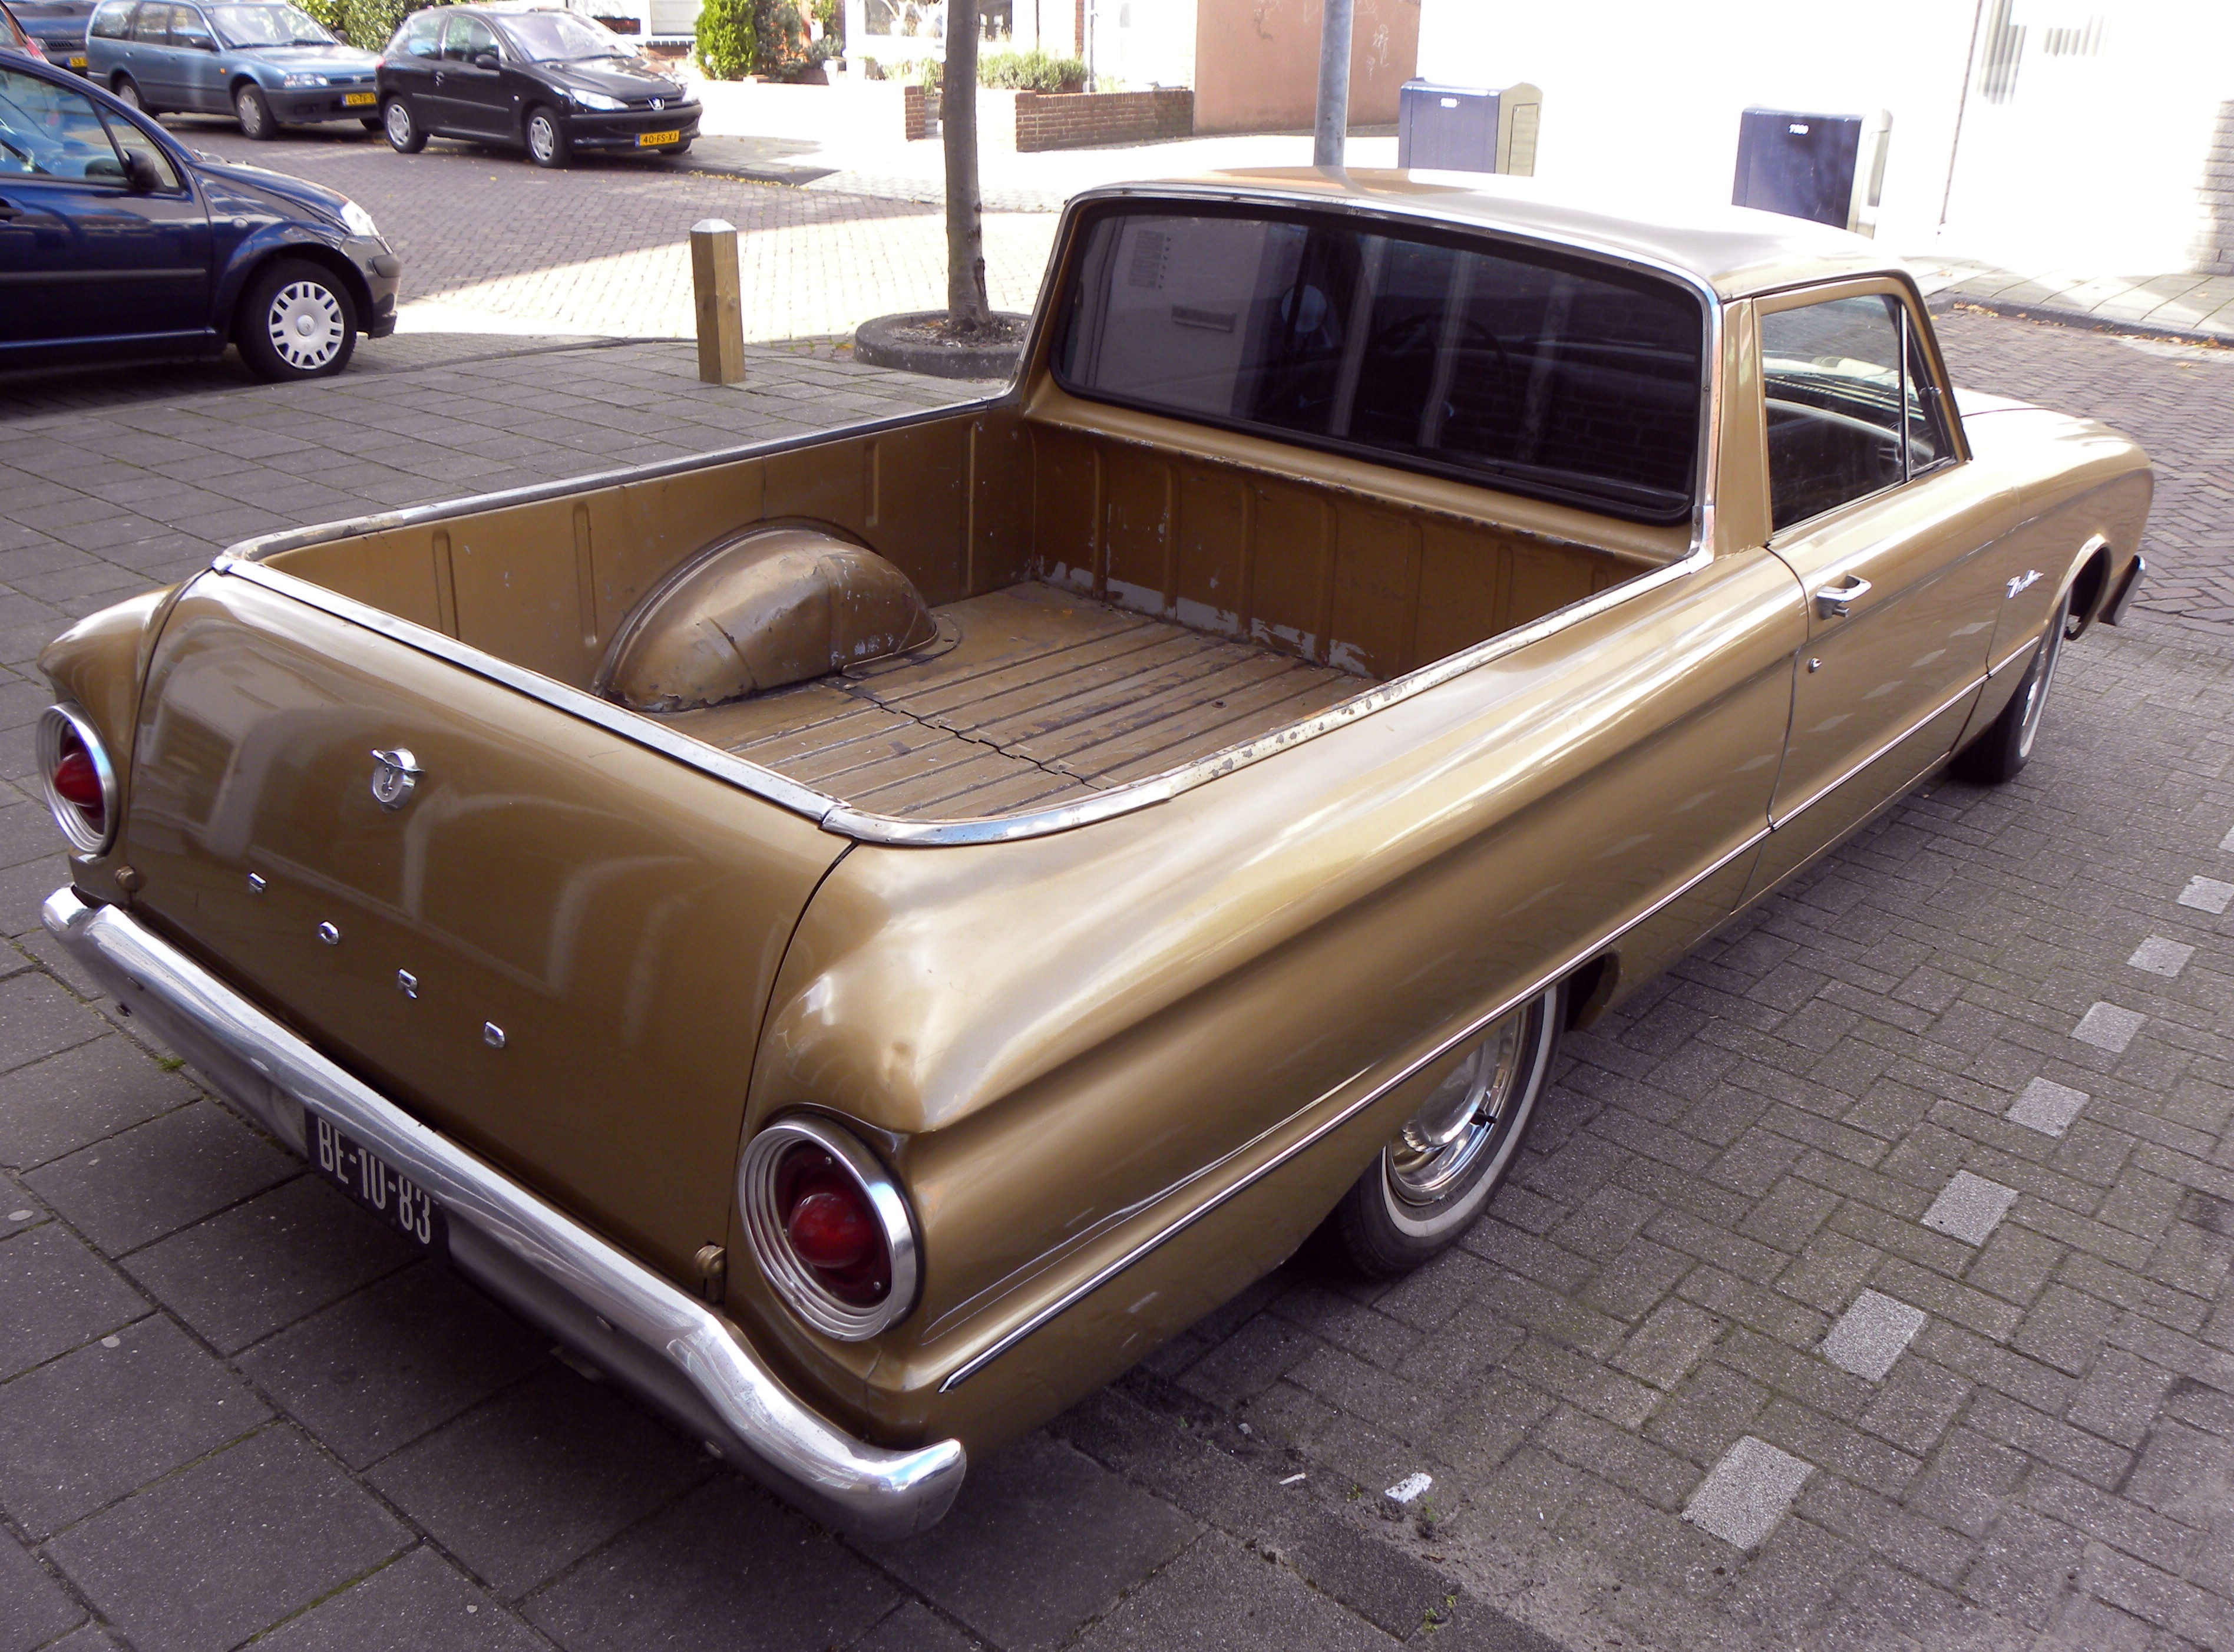 File:1963 Ford Ranchero (1).jpg - Wikimedia Commons